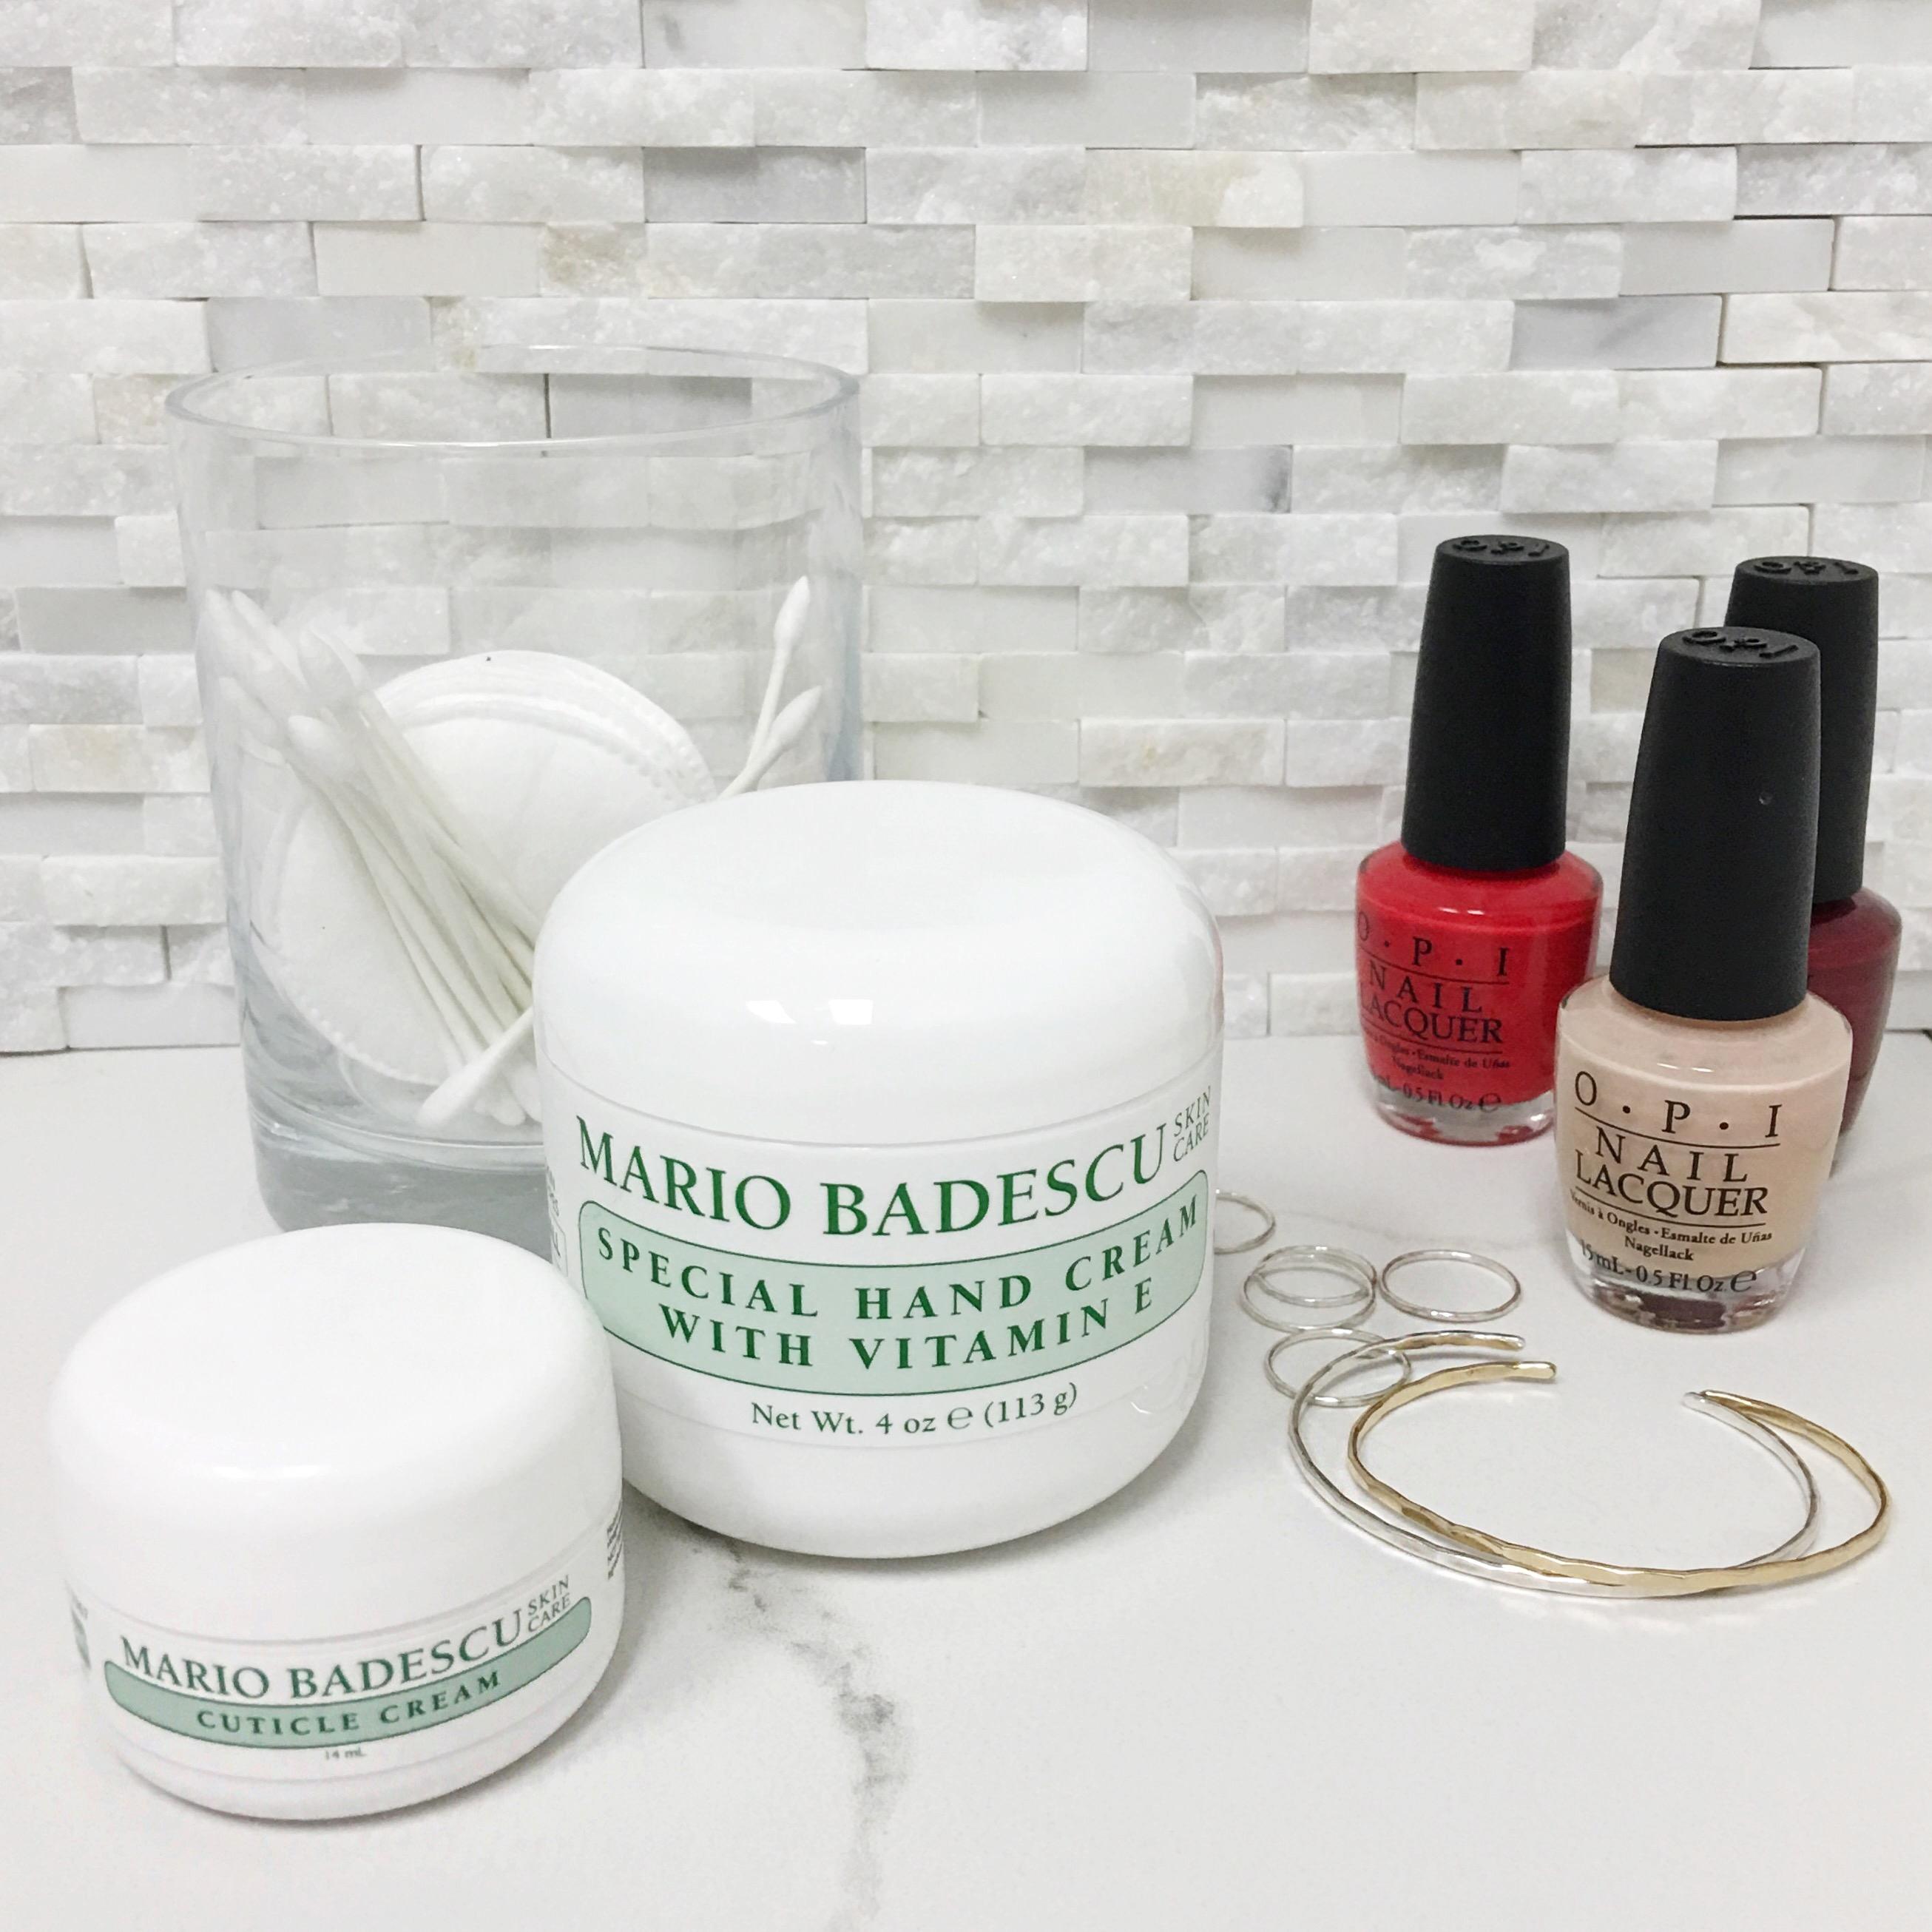 01.14.16 - Resolution, Hand Care best hand creams